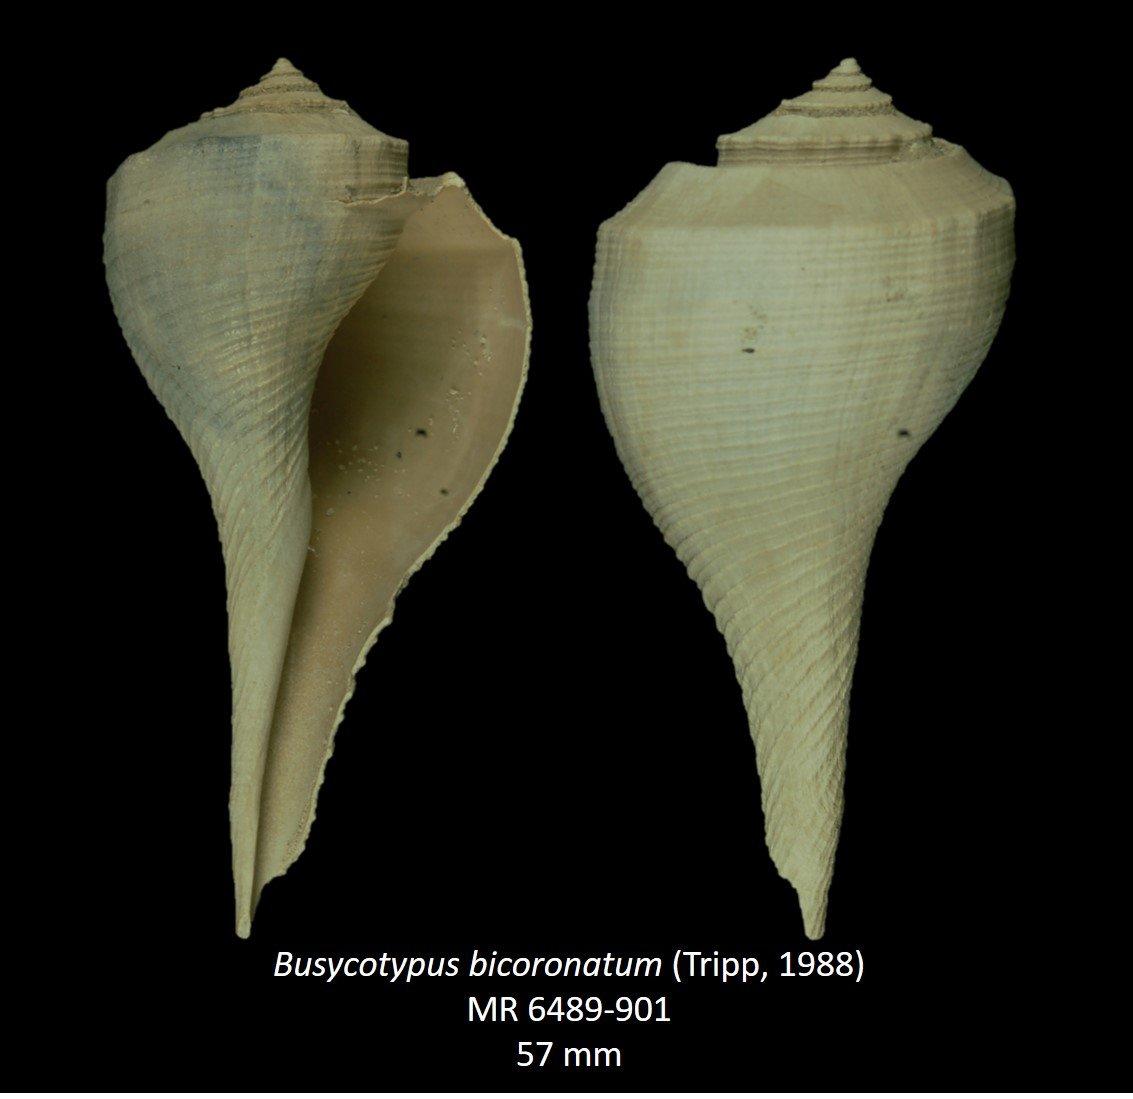 Busycotypus bicoronatum